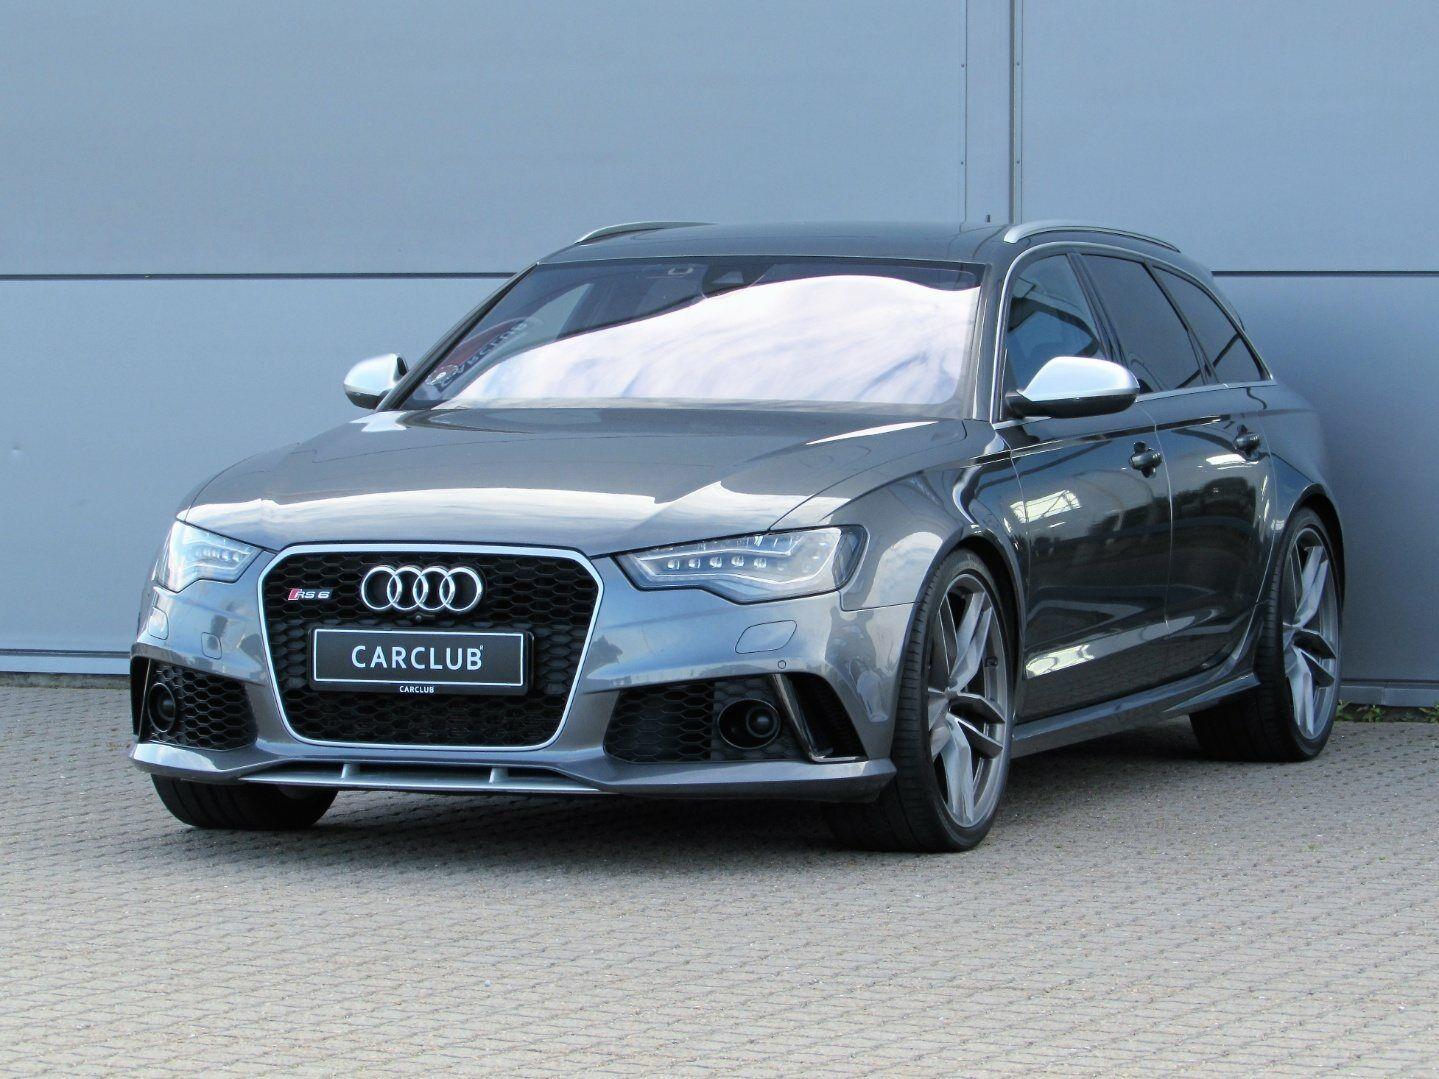 Audi RS6 4,0 TFSi Avant quattro Tiptr. 5d - 849.900 kr.